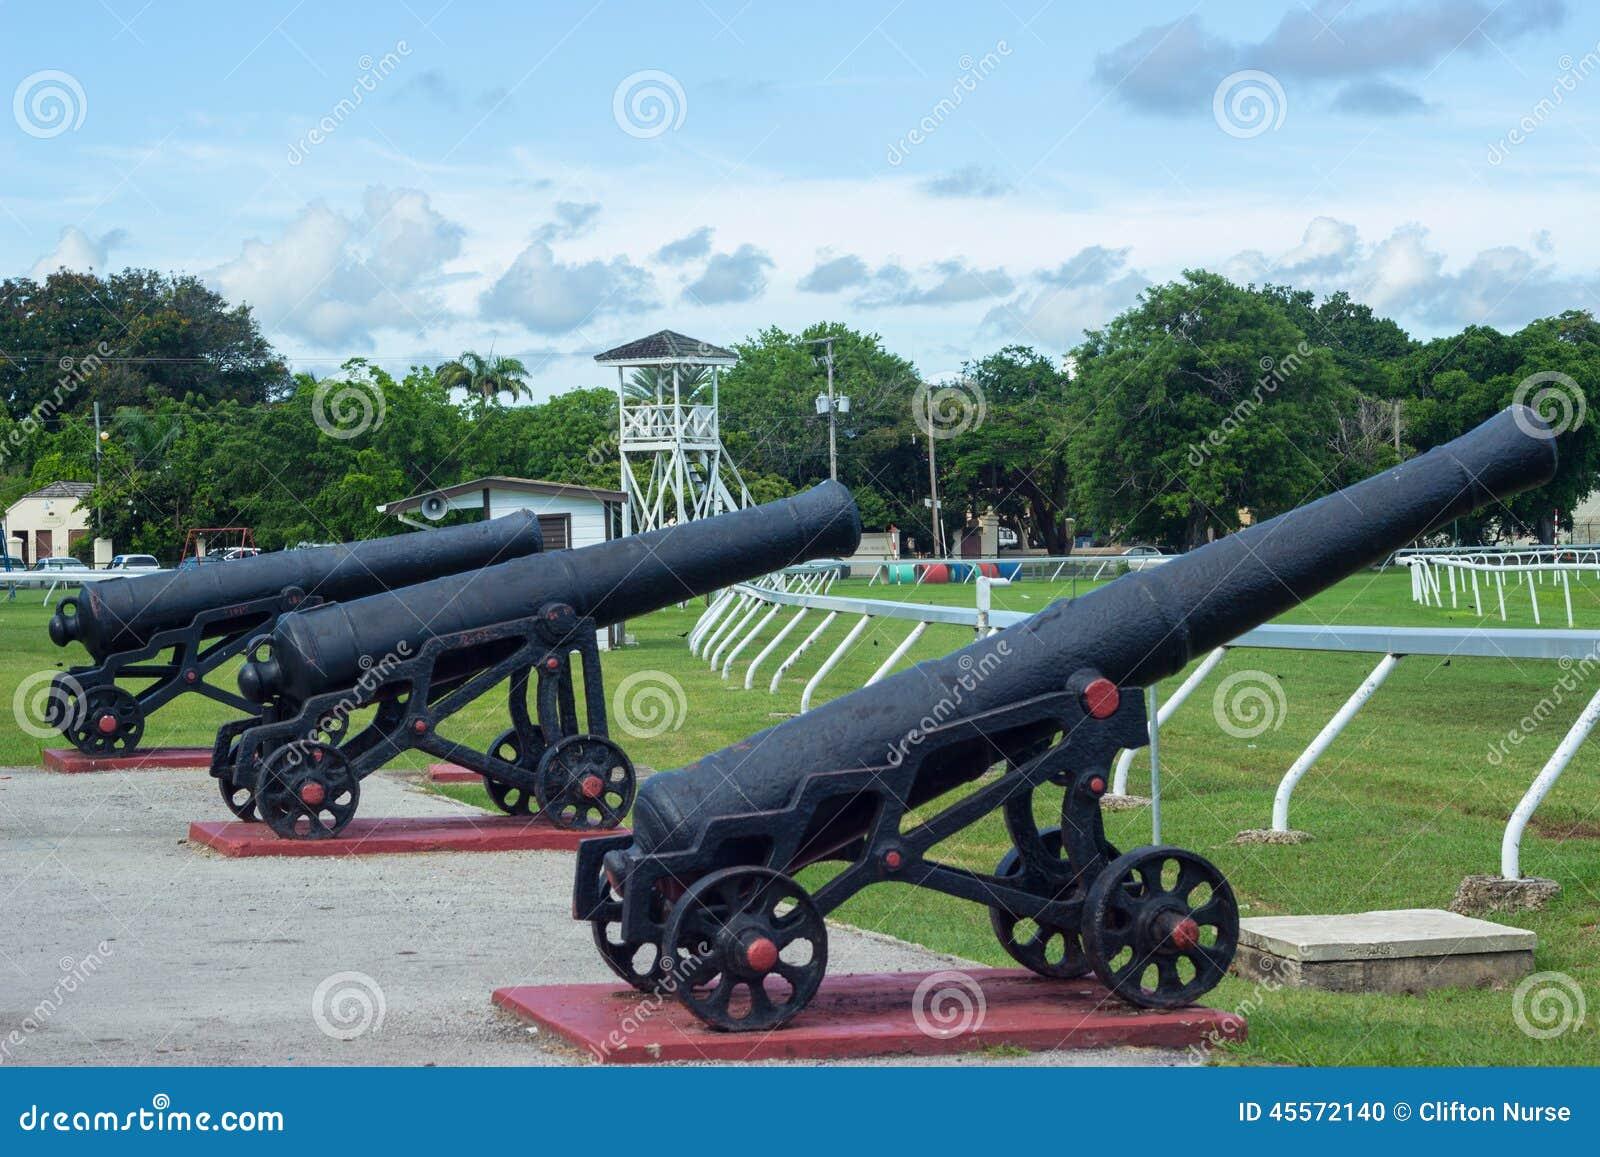 Historic Canon at the Garrison Savannah in Barbados